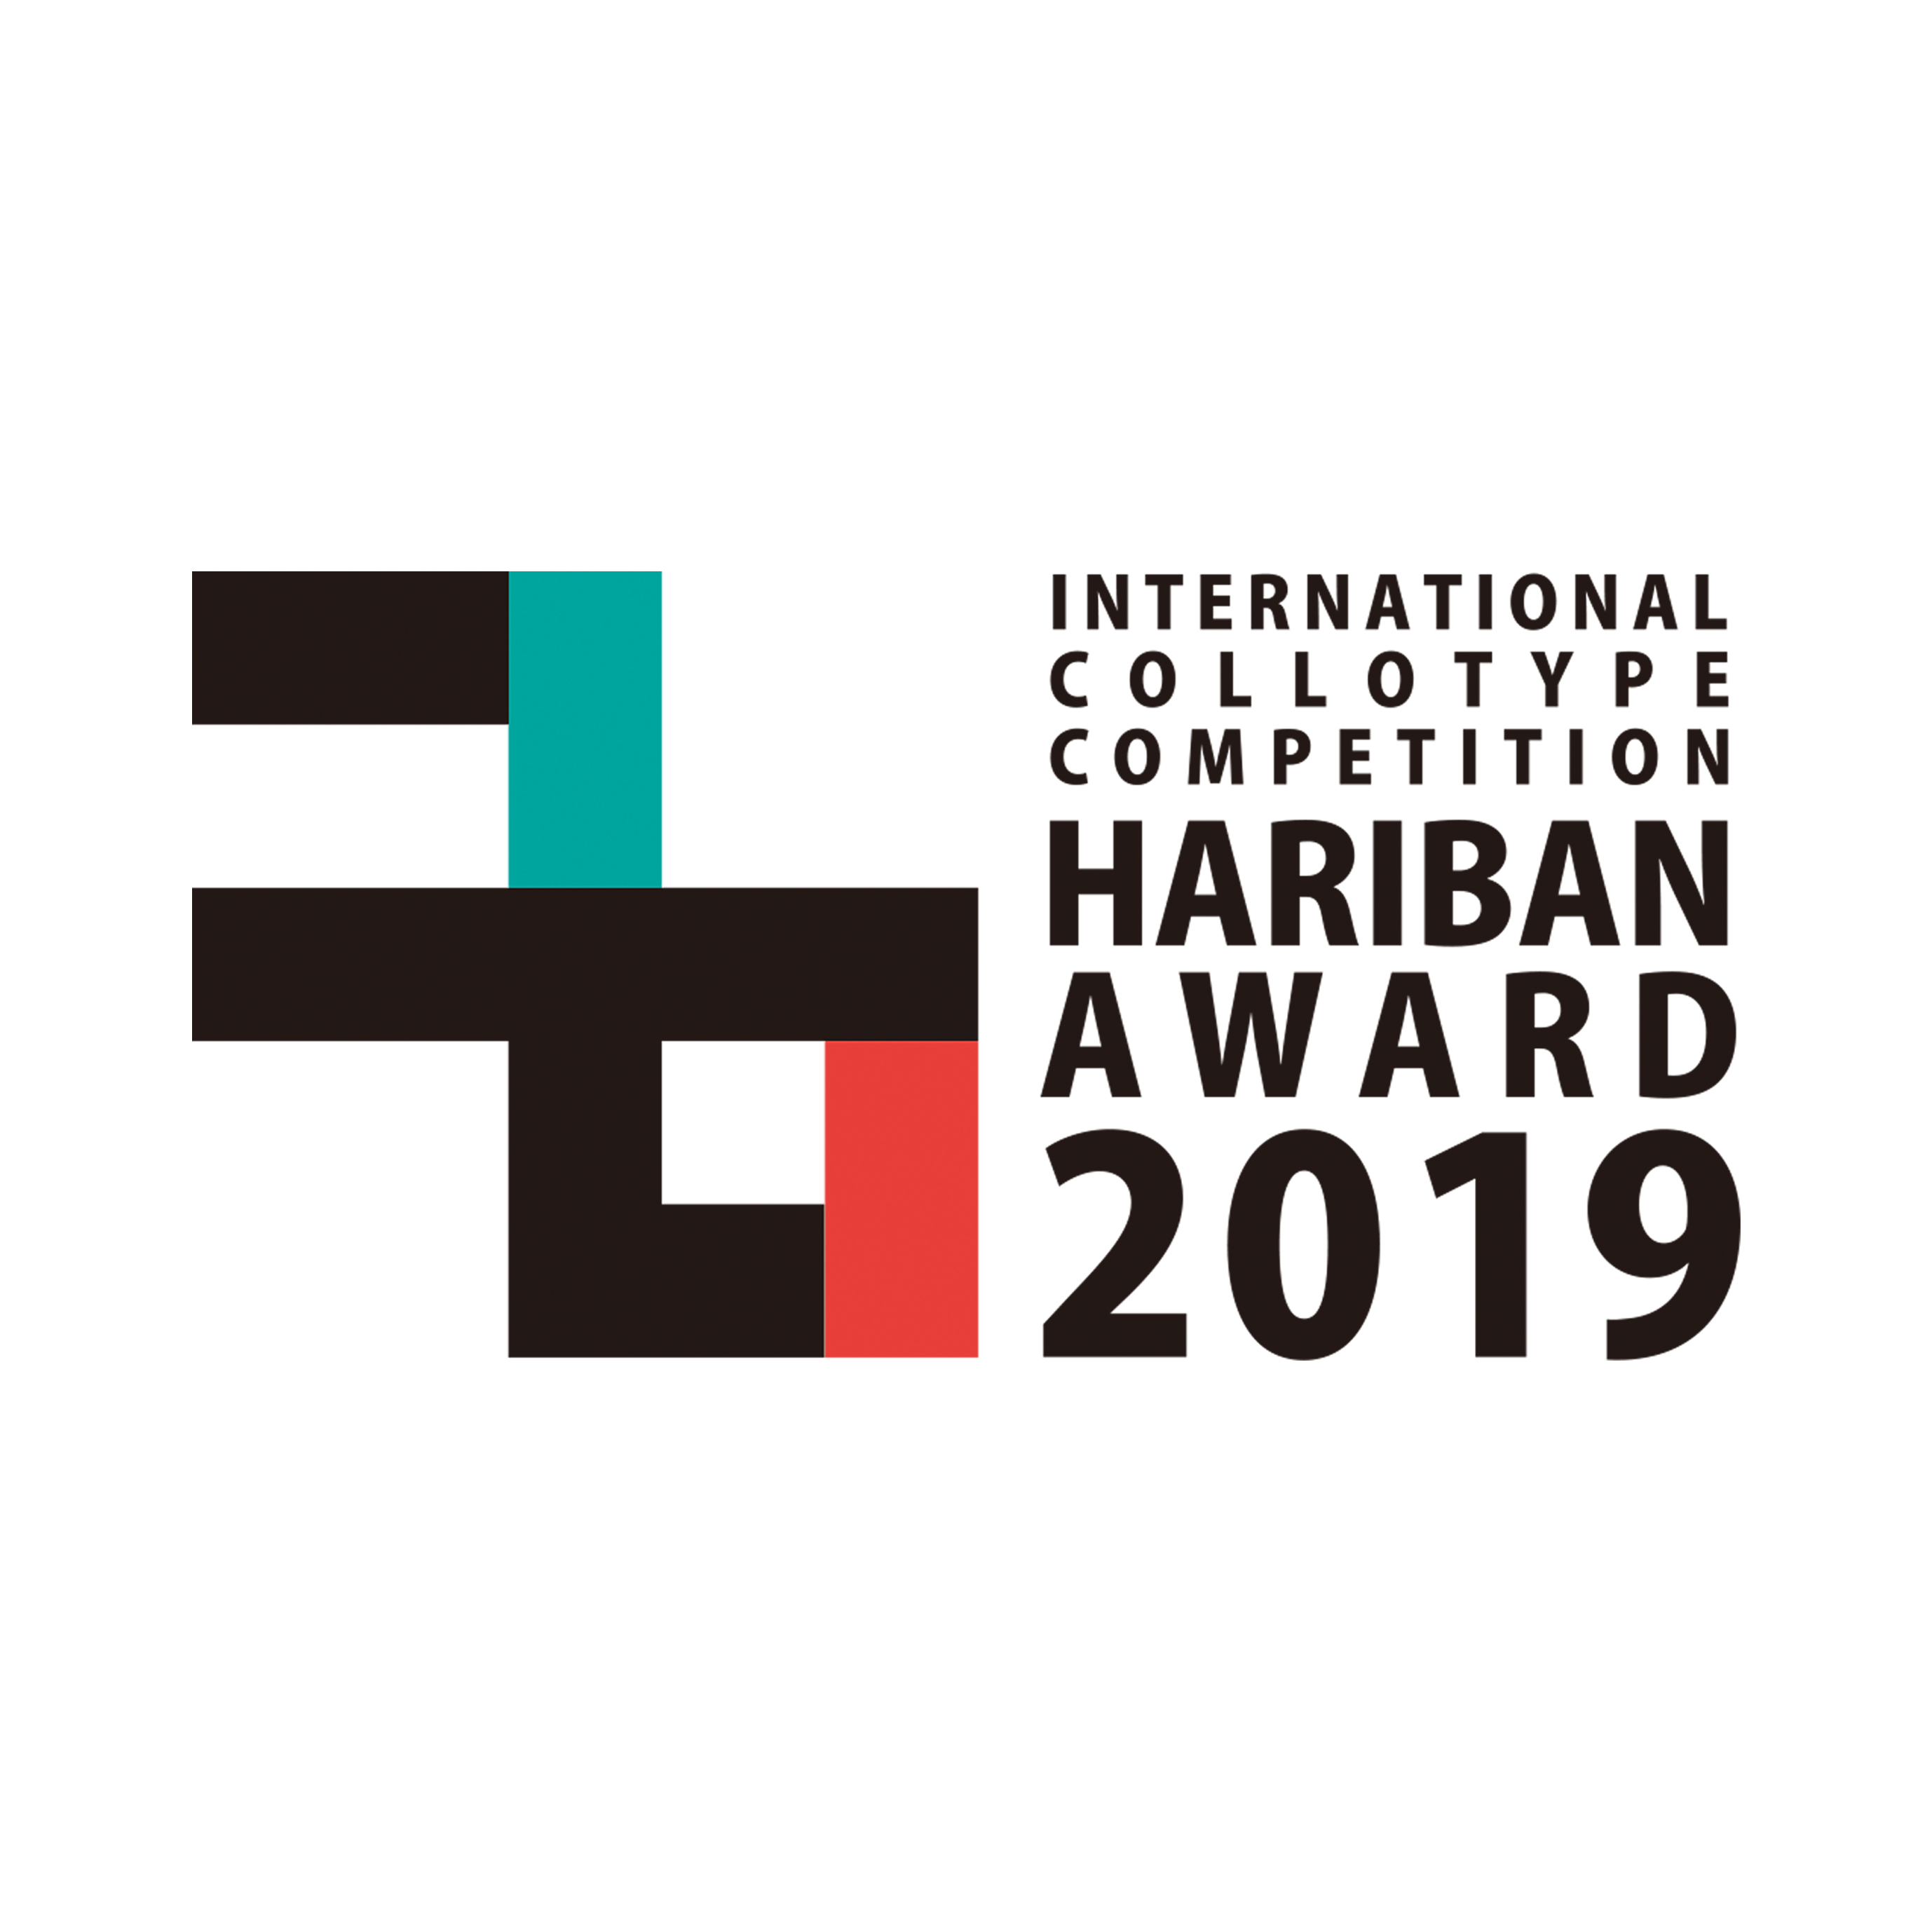 Hariban Award 2019 - logo